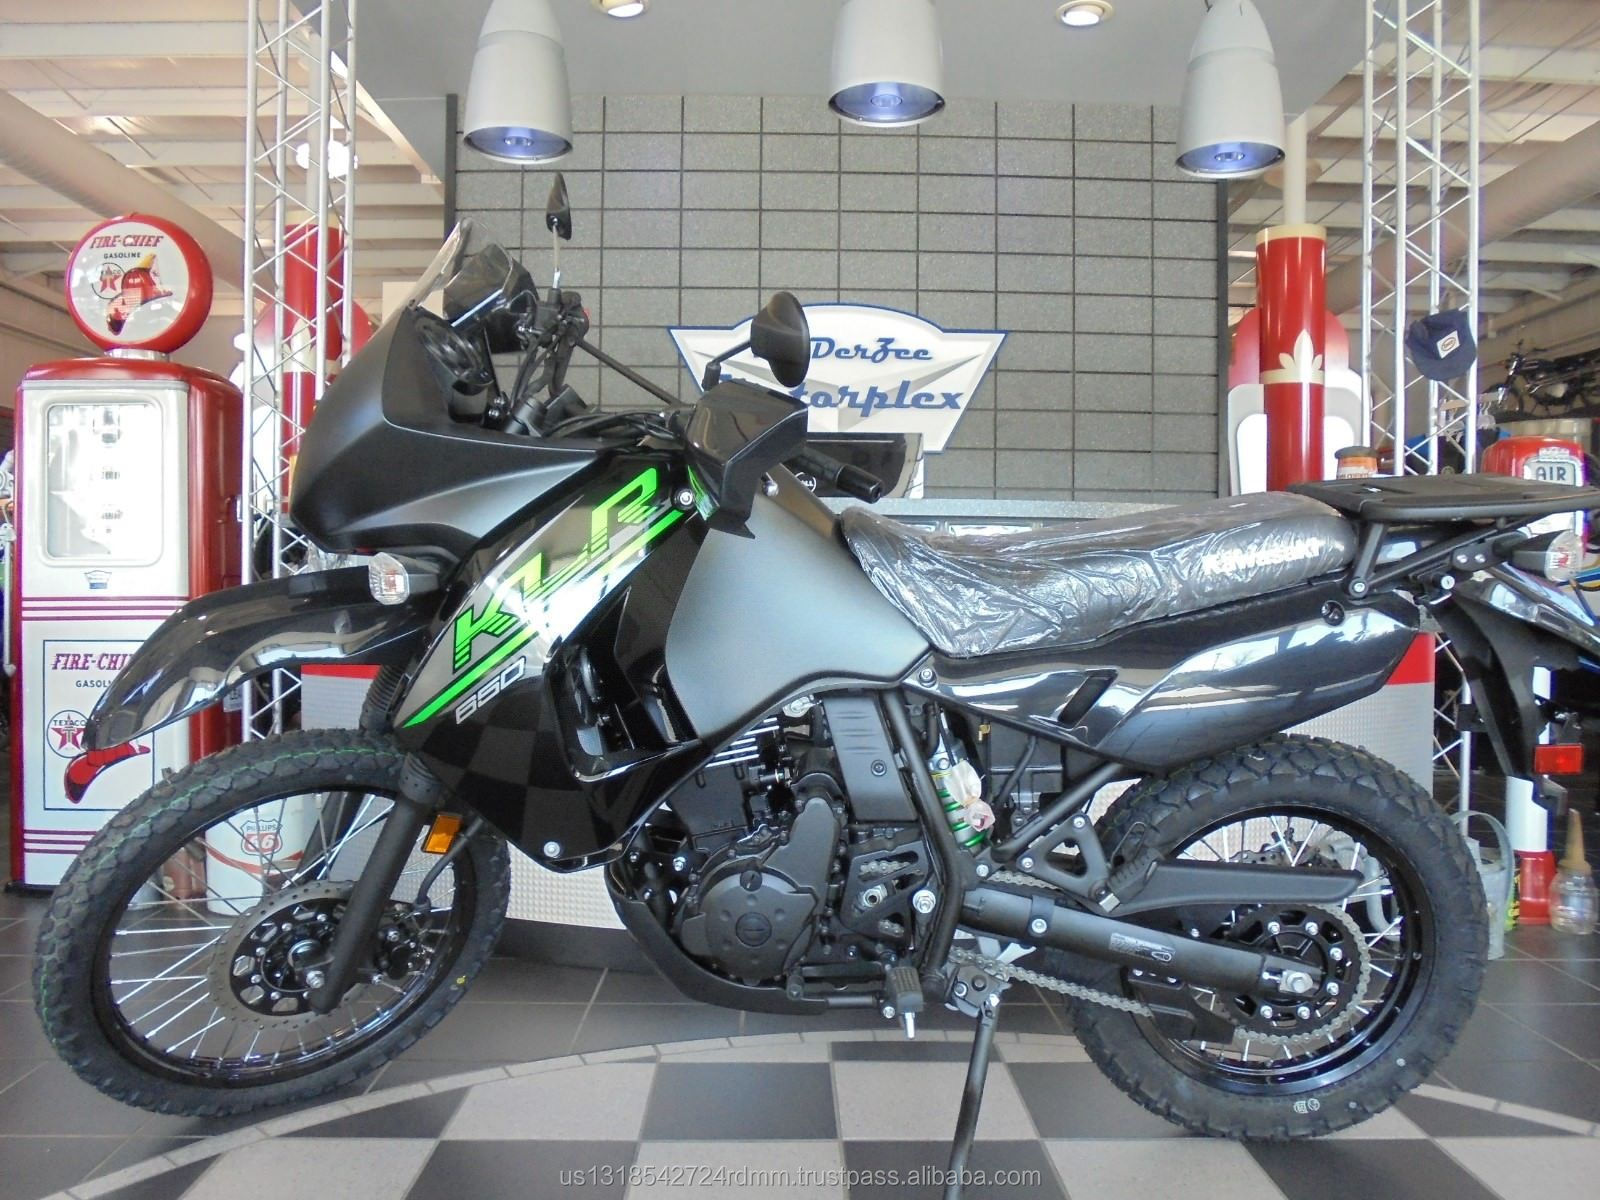 INTERNATIONAL MOTORCYCLE RACING SOLVALLA POSTER FLAT TRACK RACER DAREDEVIL STUNT